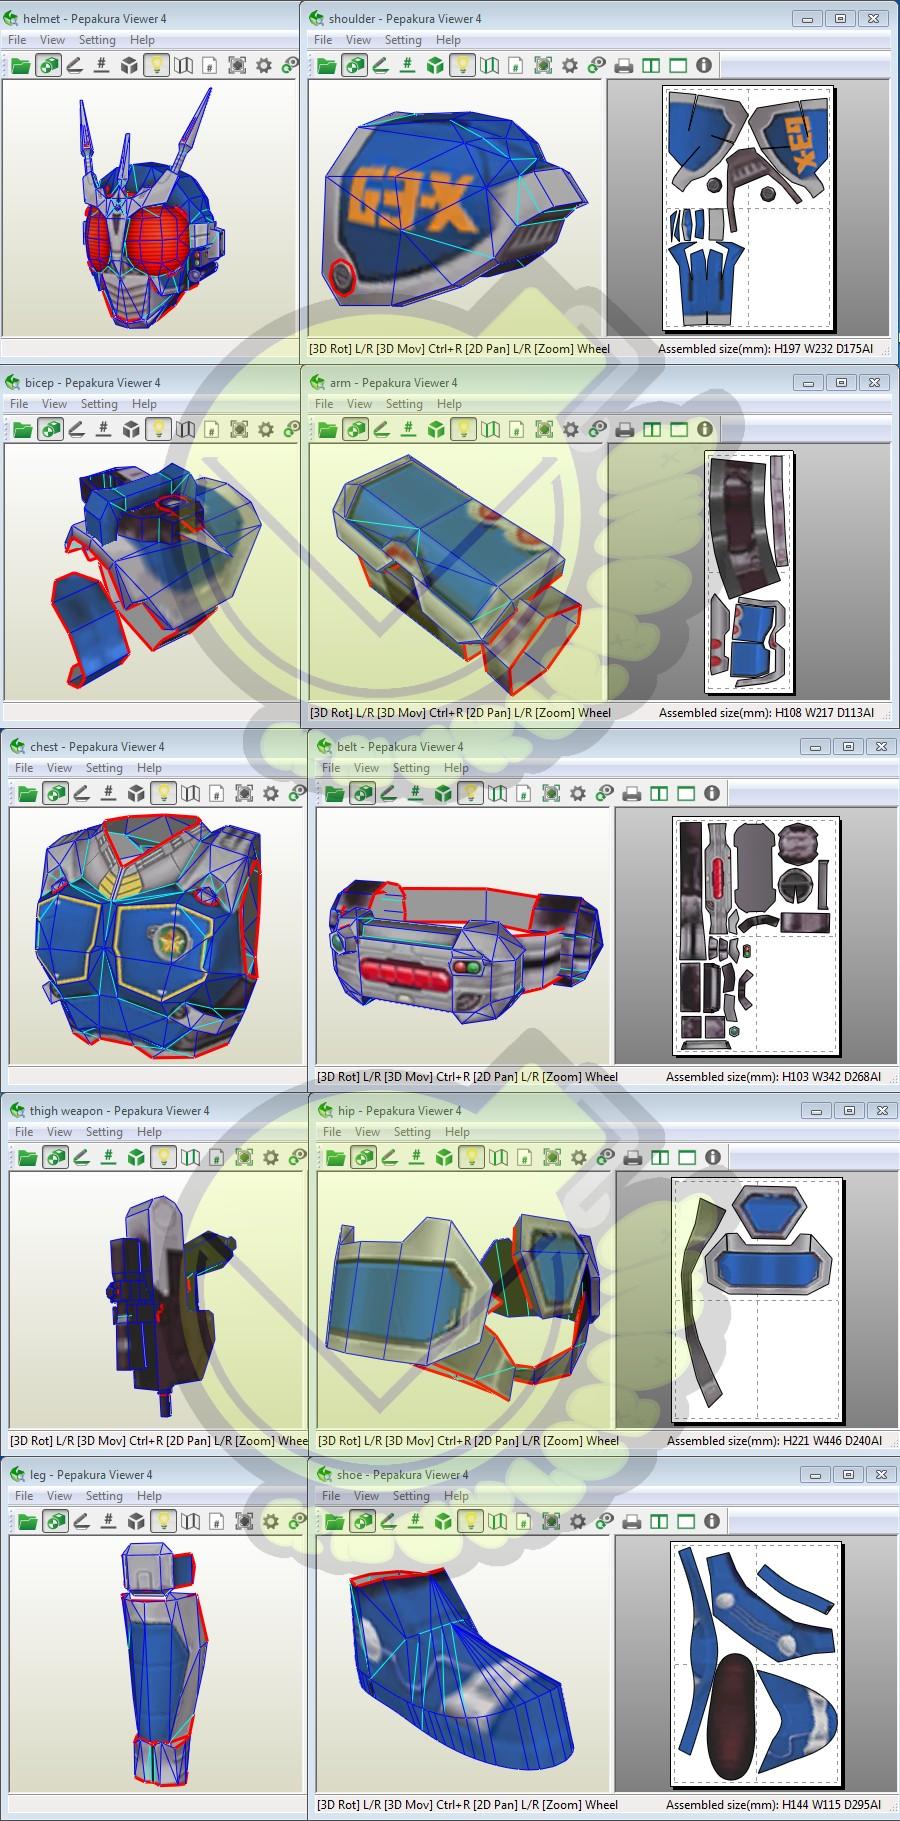 Halo Papercraft Clone Trooper Armor Pepakura Files for Mac